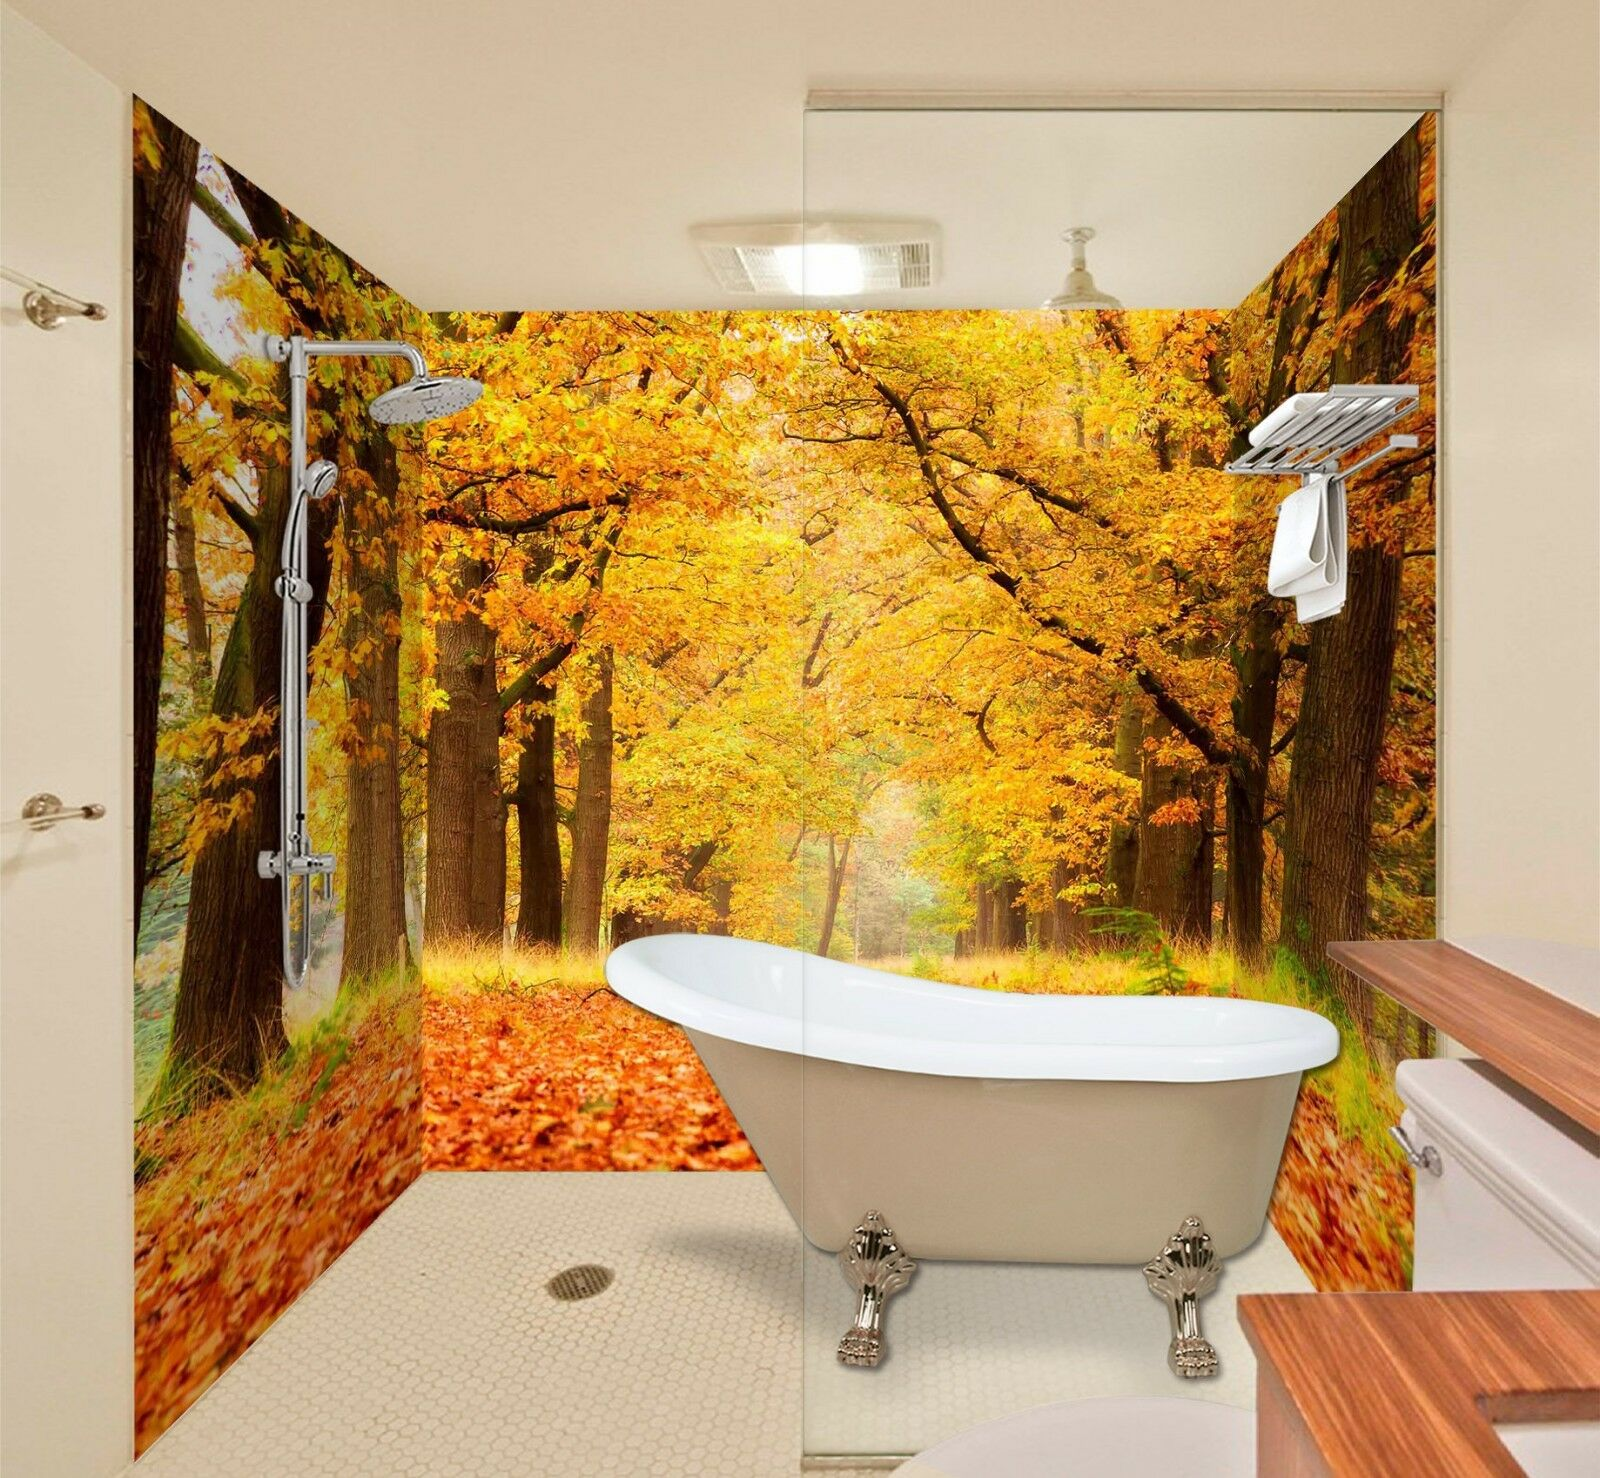 3D Autumn Forest 577  WallPaper Bathroom Print Decal Wall Deco AJ WALL CA Carly